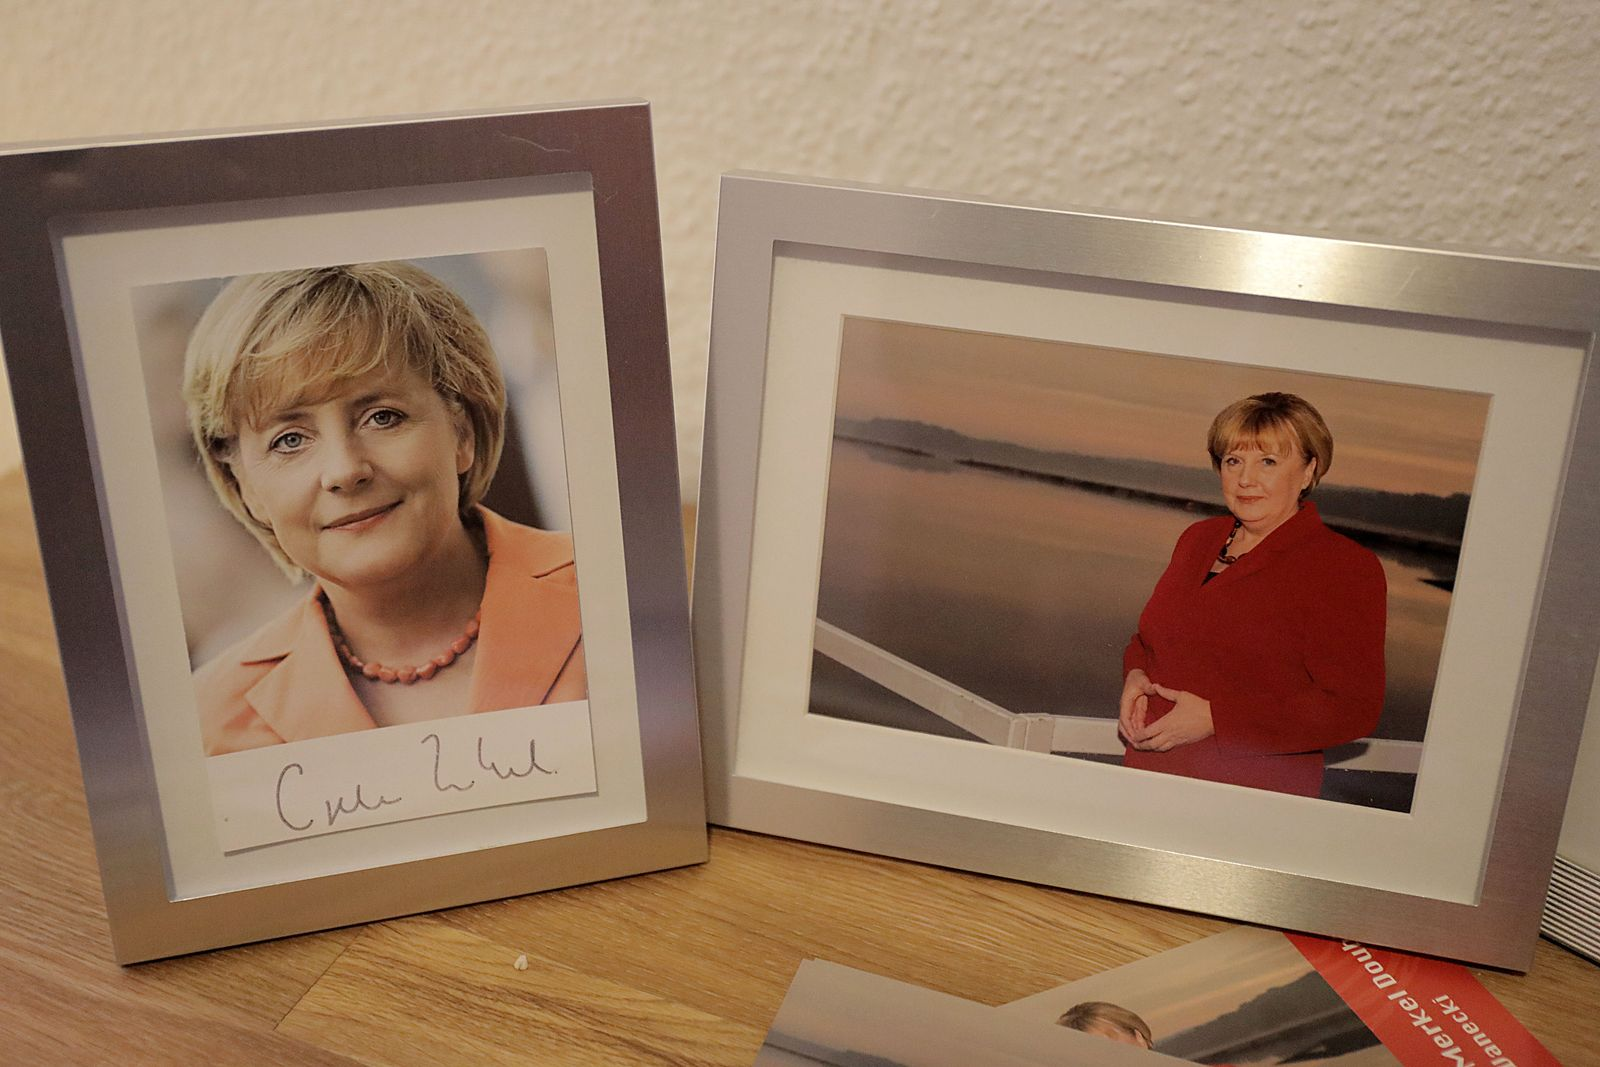 Merkel Double Ursula Wanecki